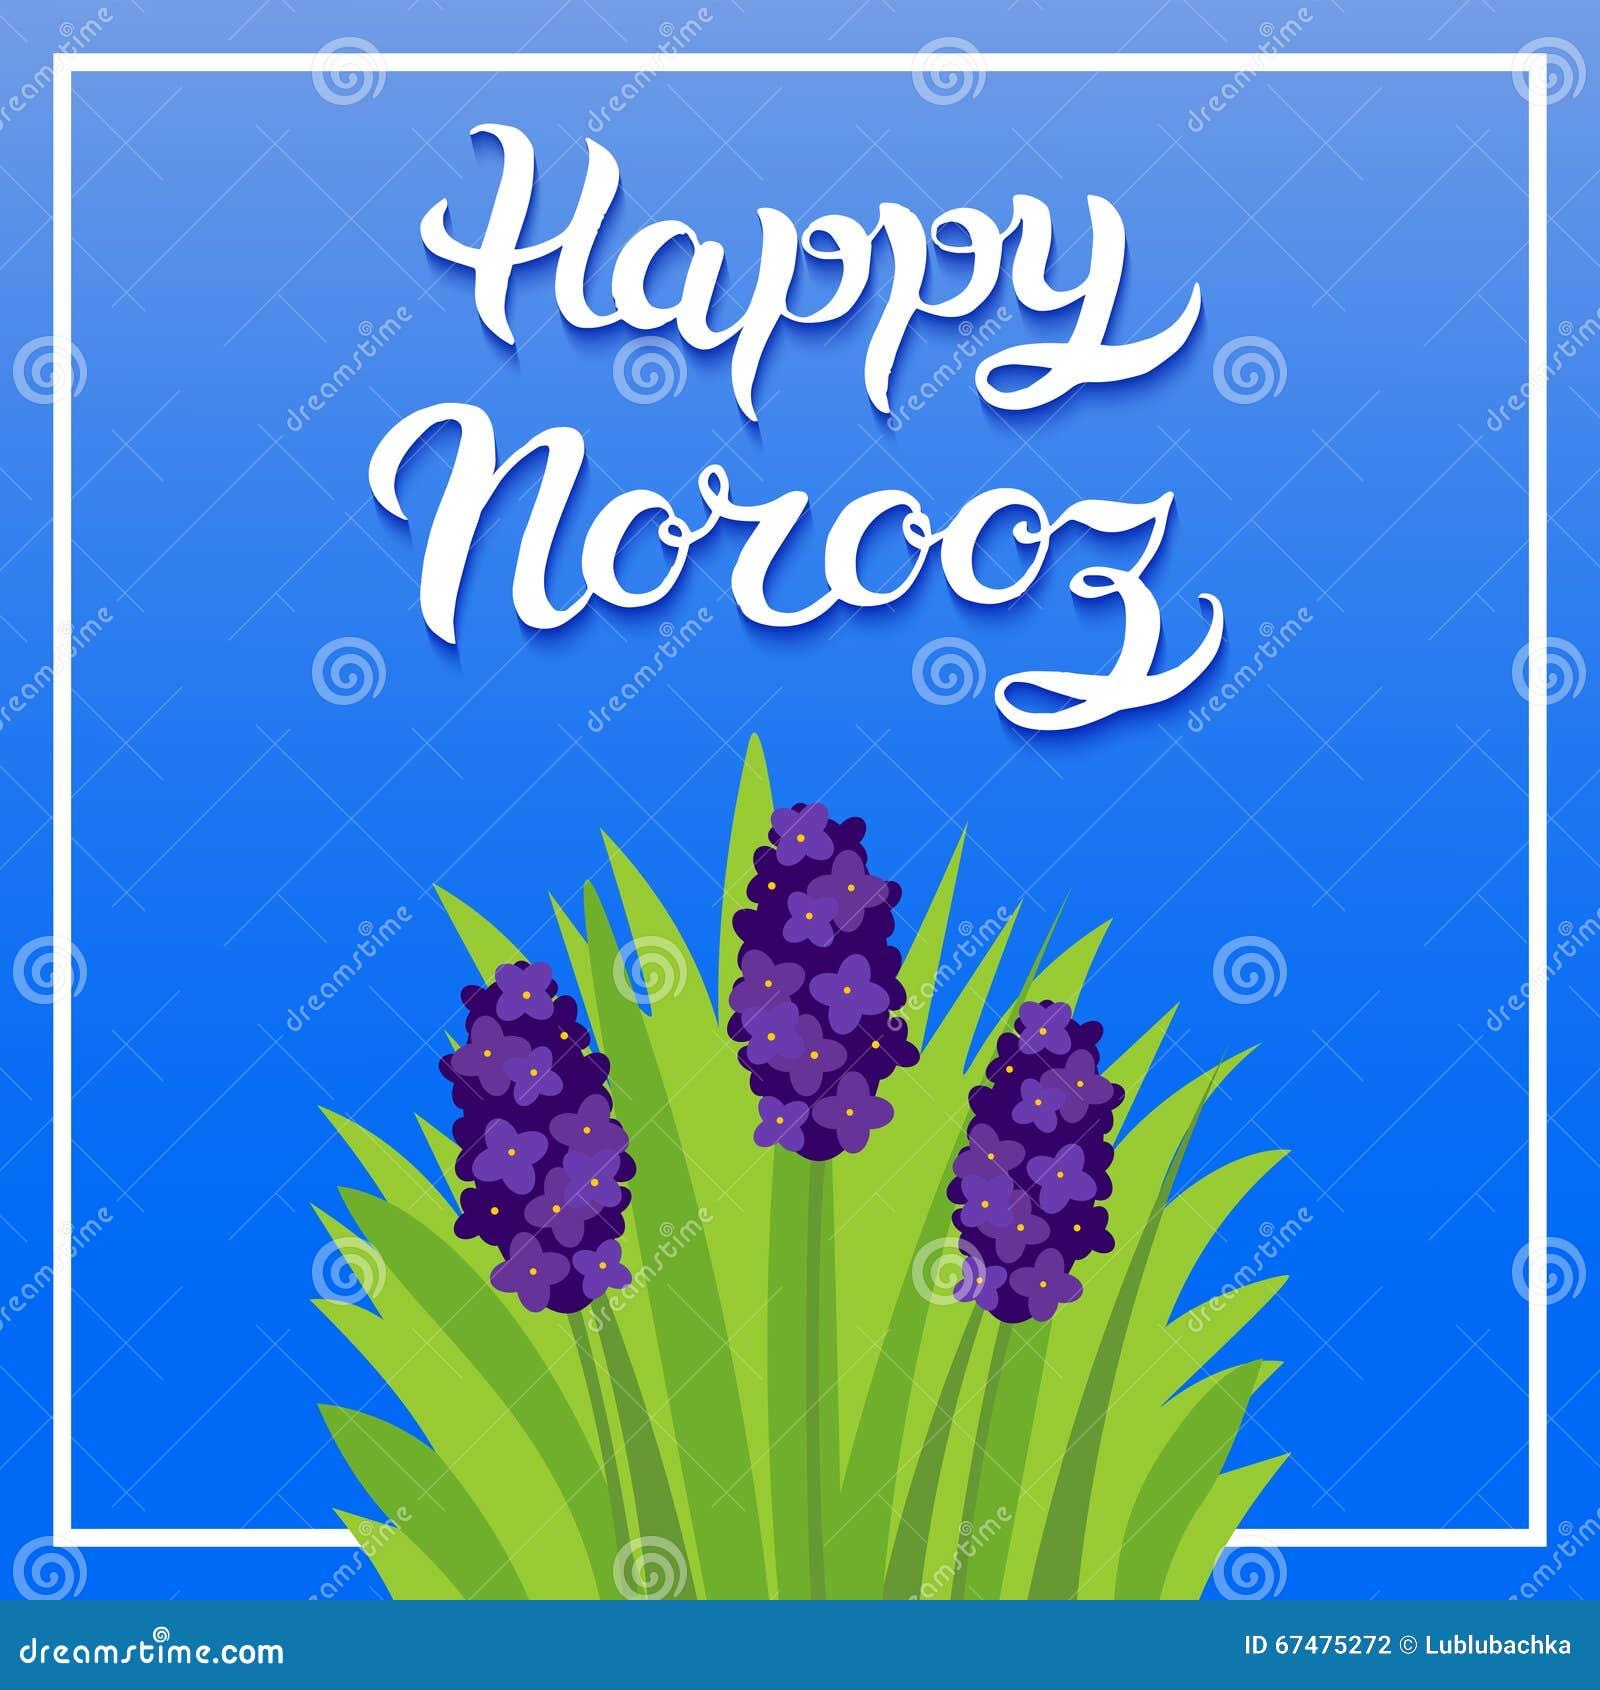 Norooz Stock Illustrations 117 Norooz Stock Illustrations Vectors